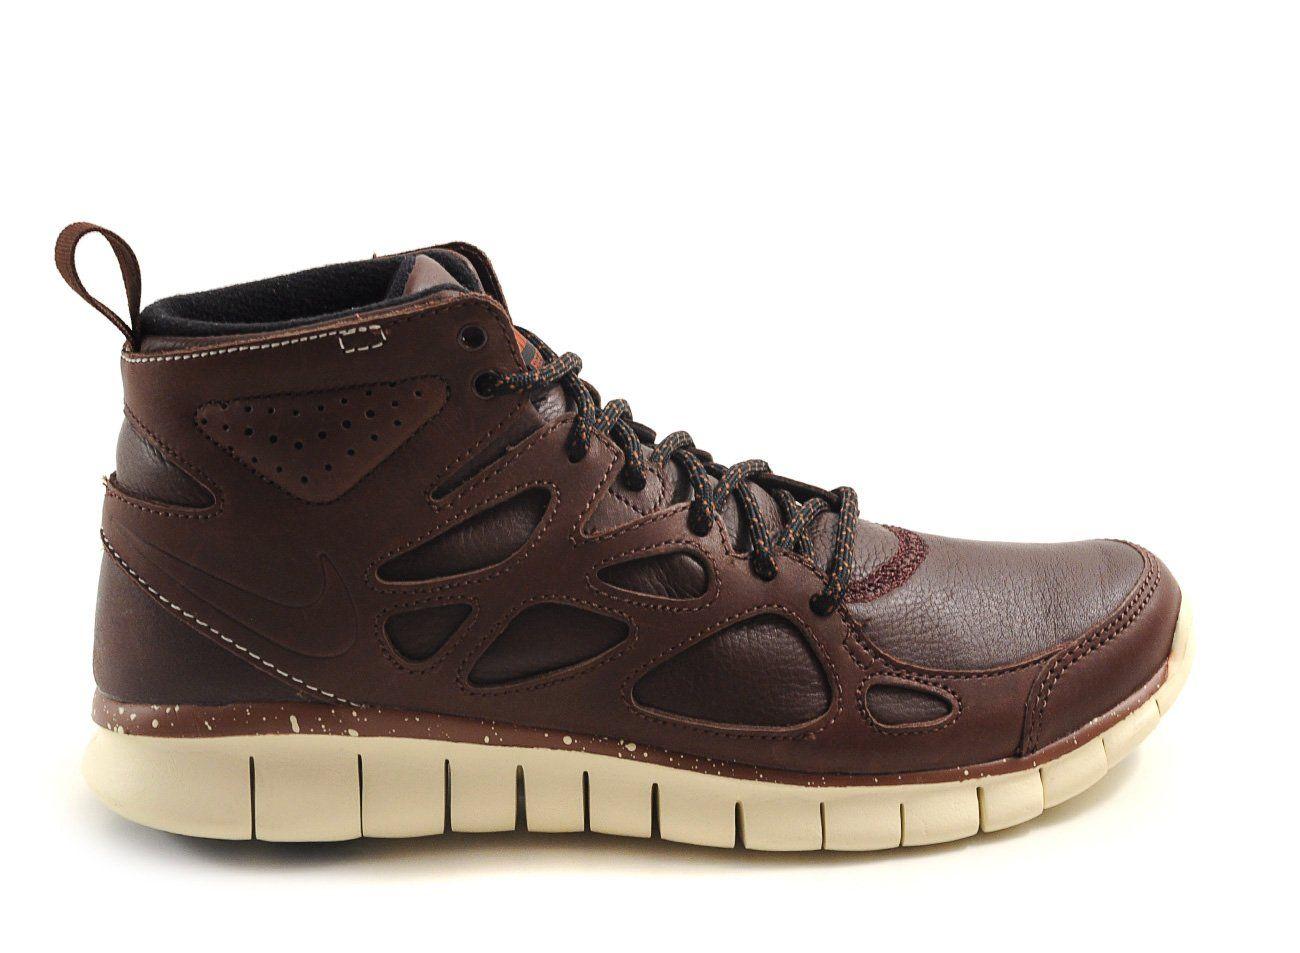 Nike Free QS 2 Barkroot BrownShoe Run Sneakerboot DEIH29